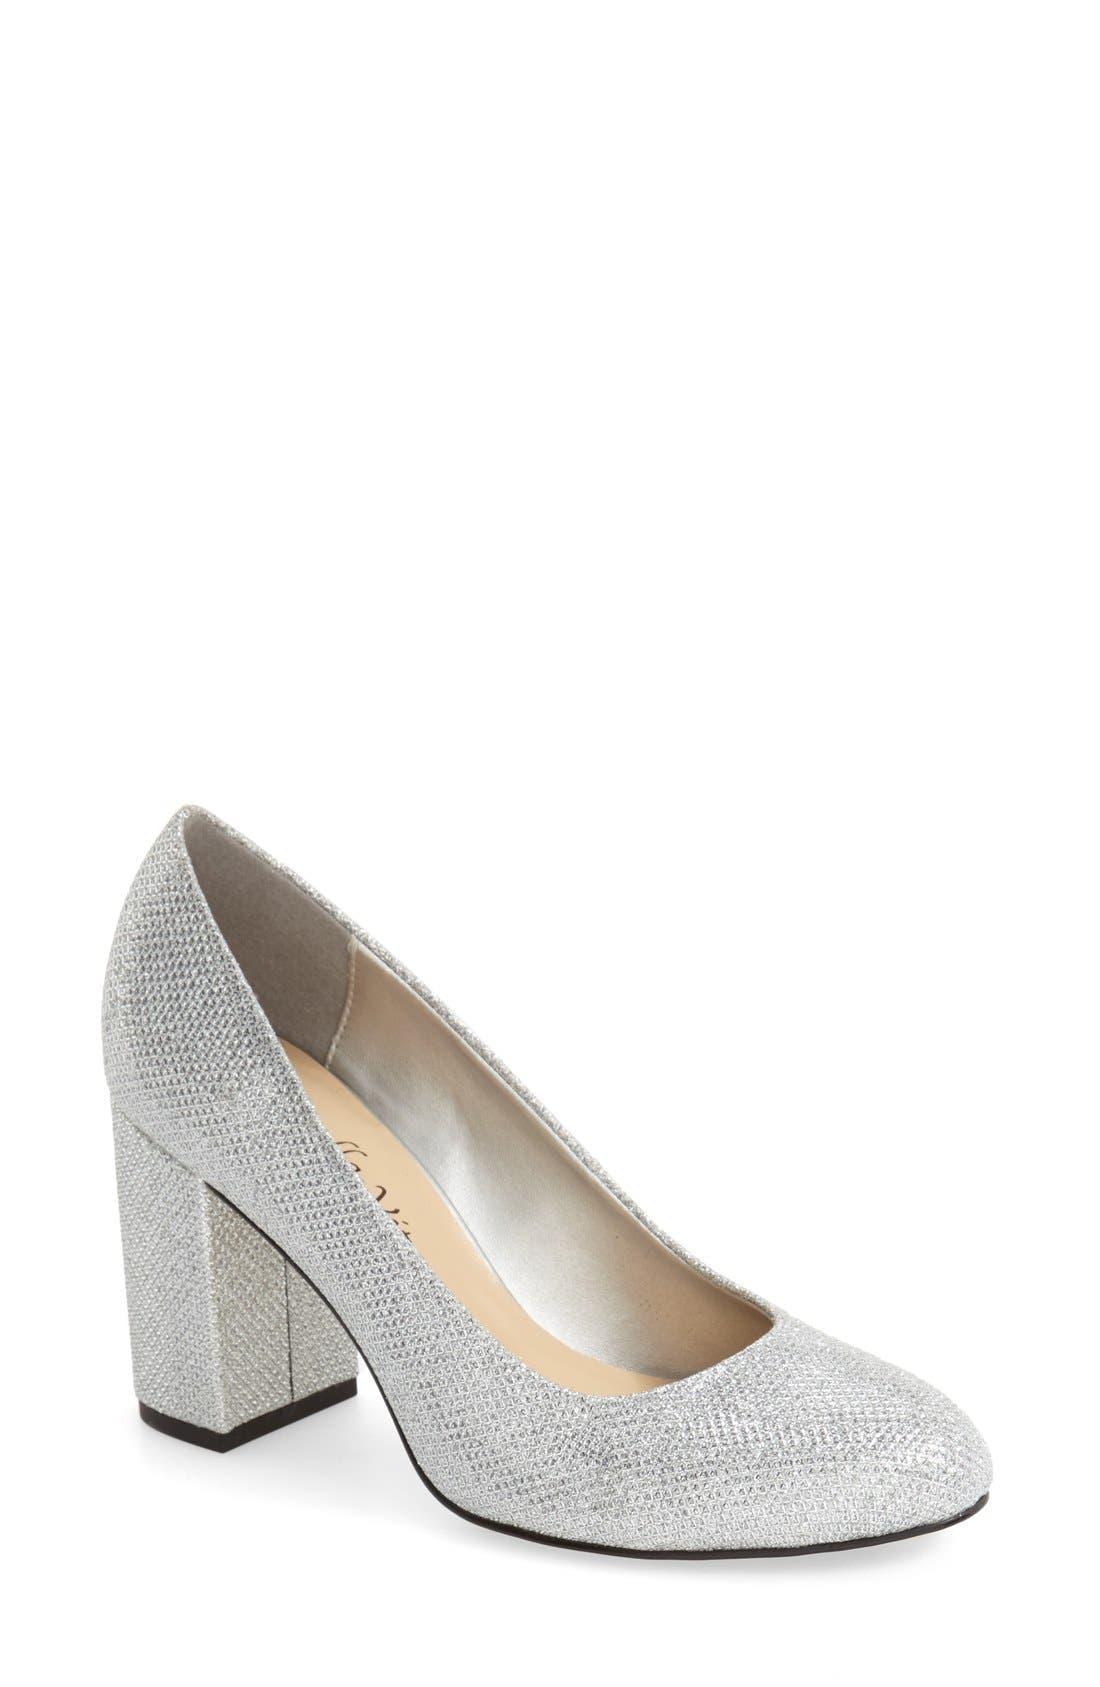 'Nara' Block Heel Pump,                             Main thumbnail 1, color,                             Silver Glitter